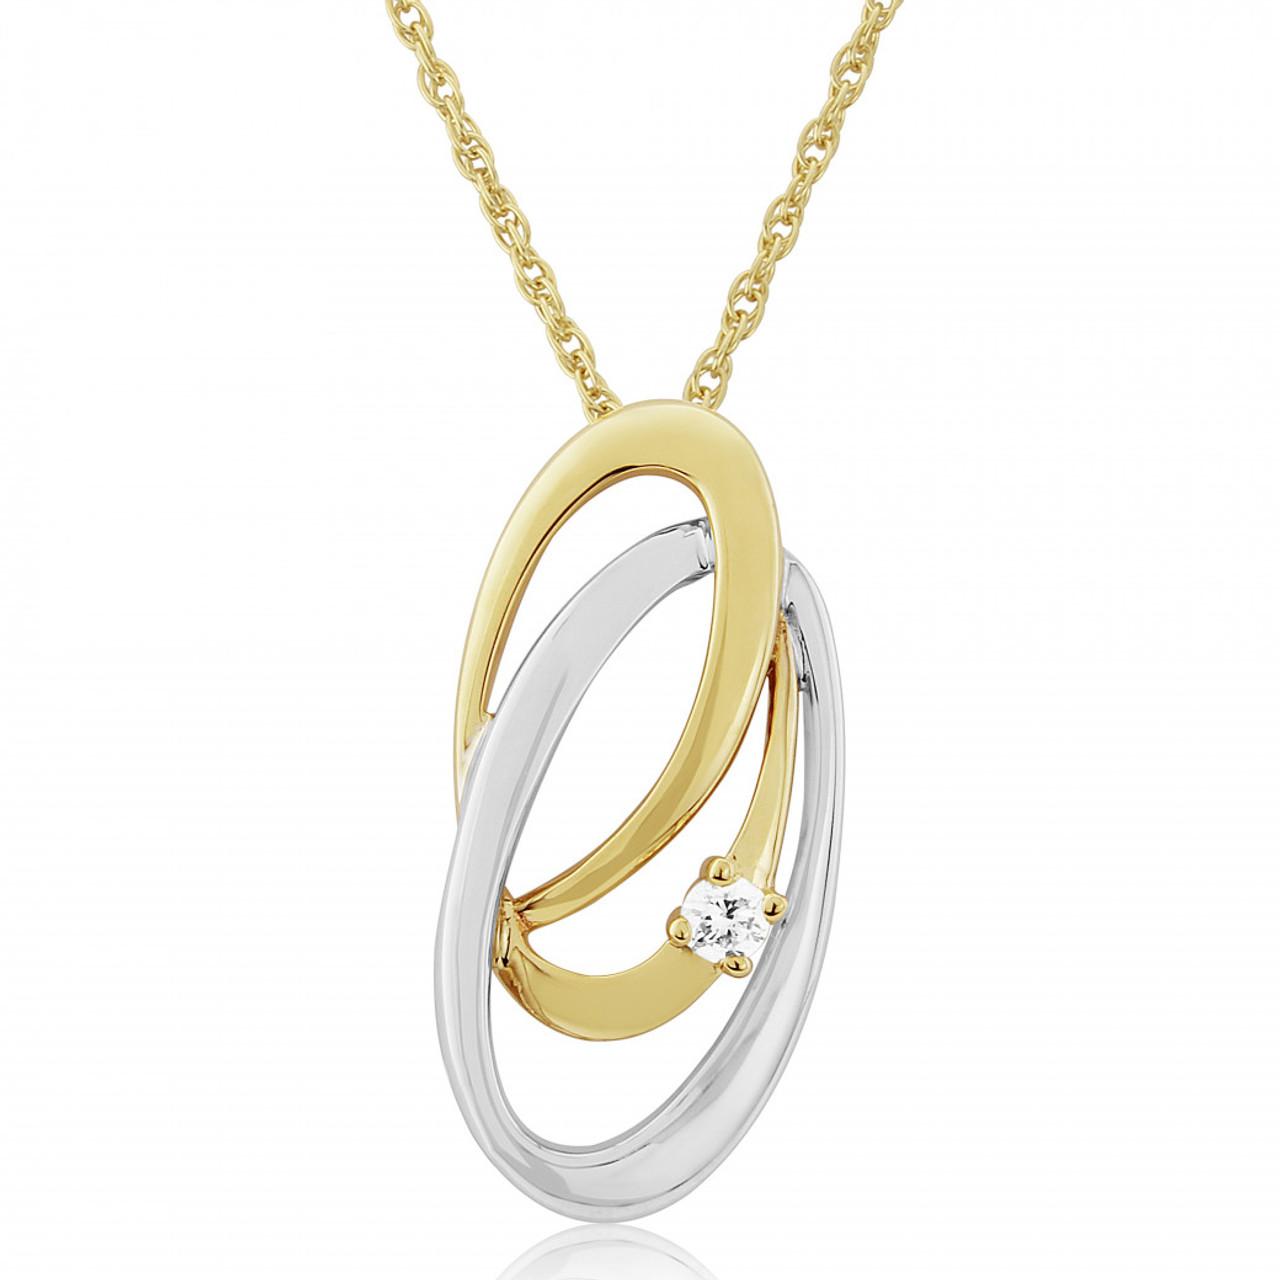 9ct Yellow & White Gold Diamond Cosmos Pendant Necklace